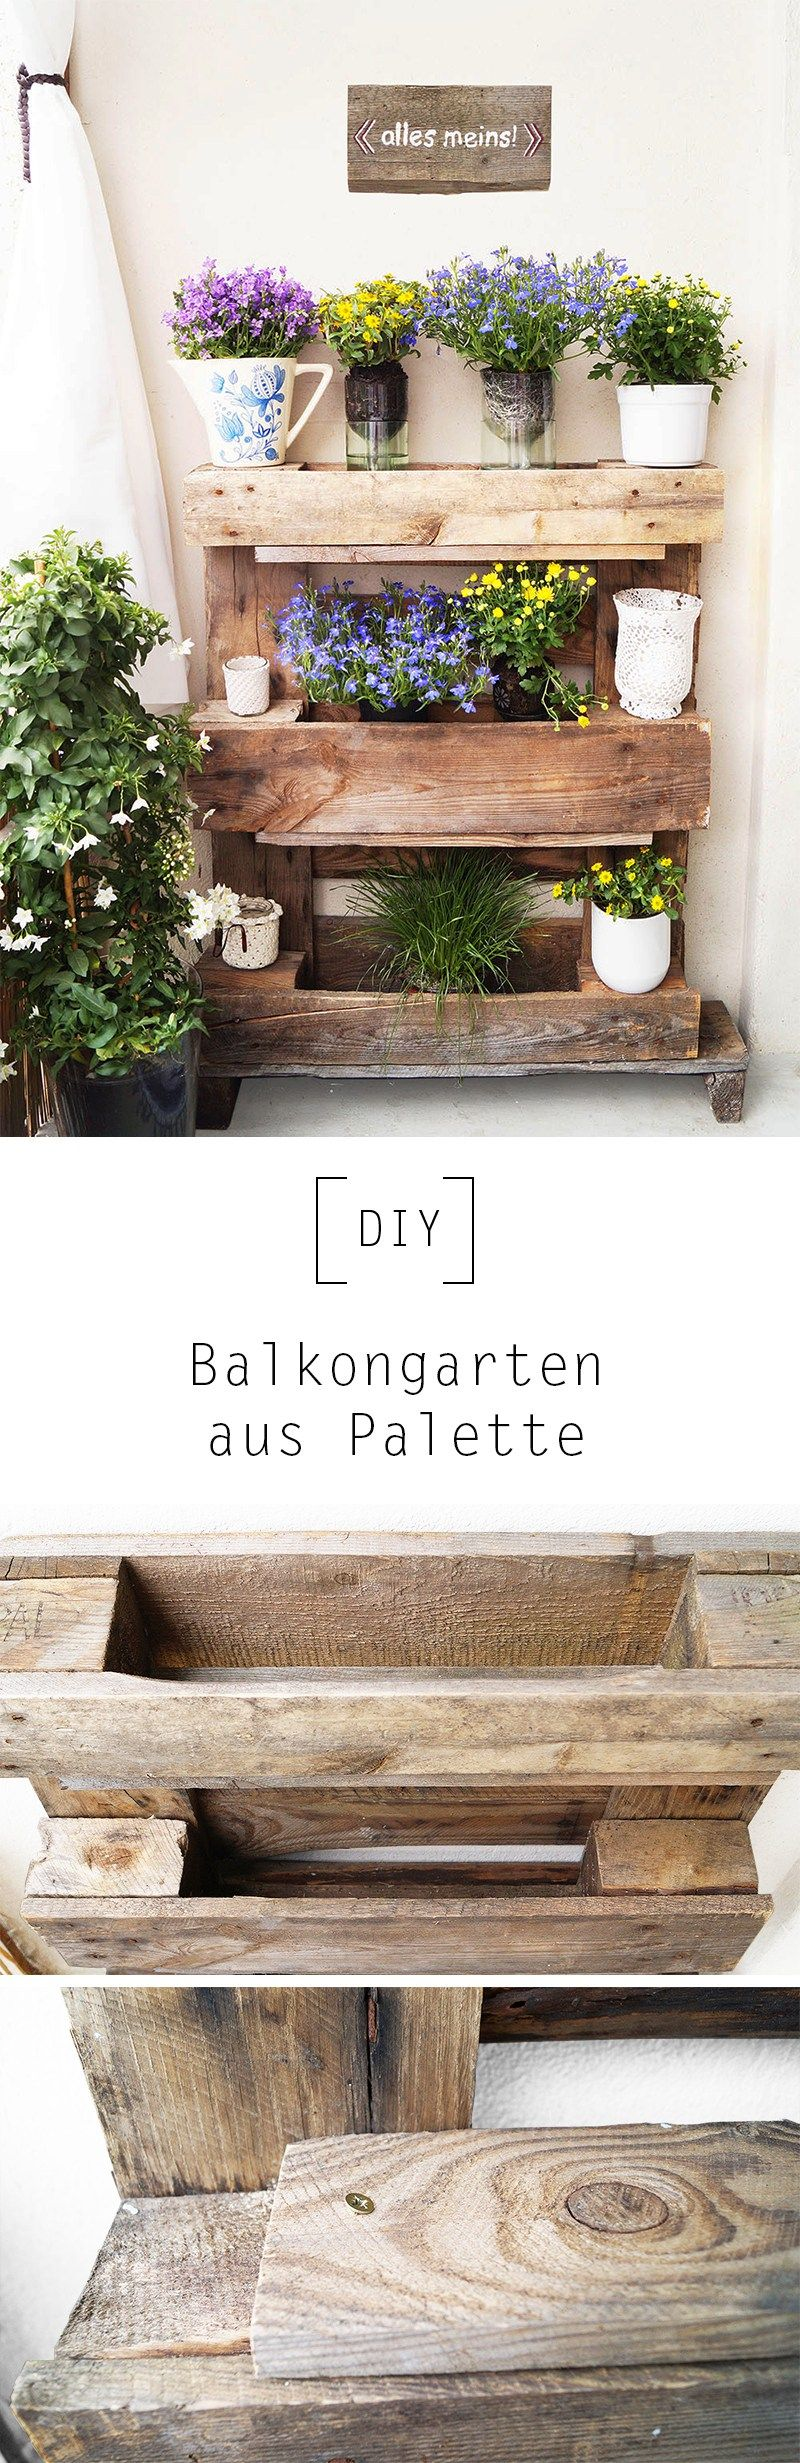 Balkongarten aus Palette Pinterest #kräutergartenpalette